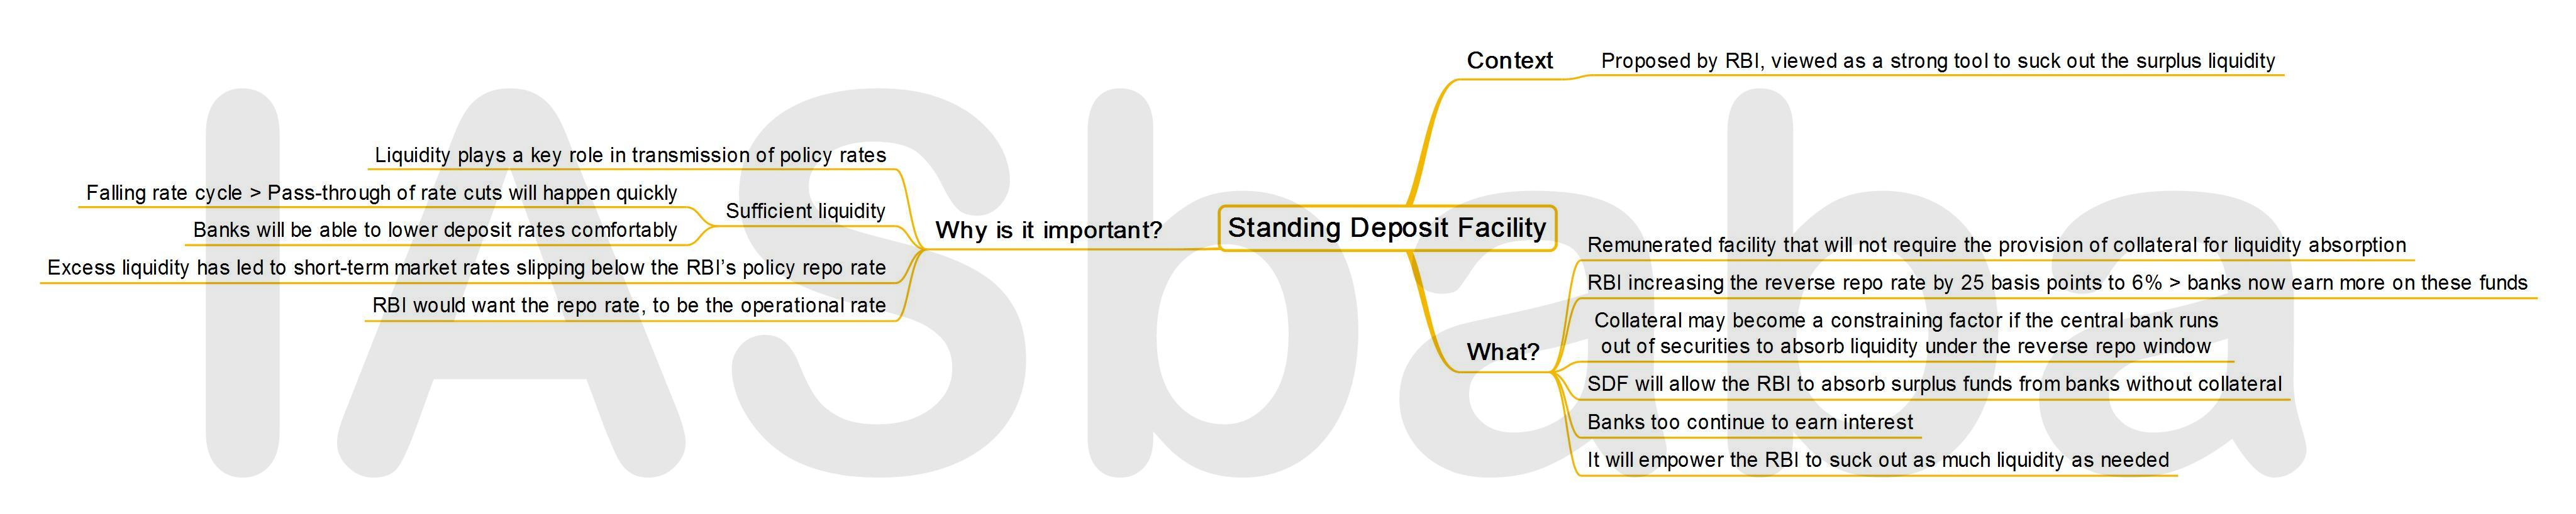 IASbaba's MINDMAP : Issue - Standing Deposit Facility